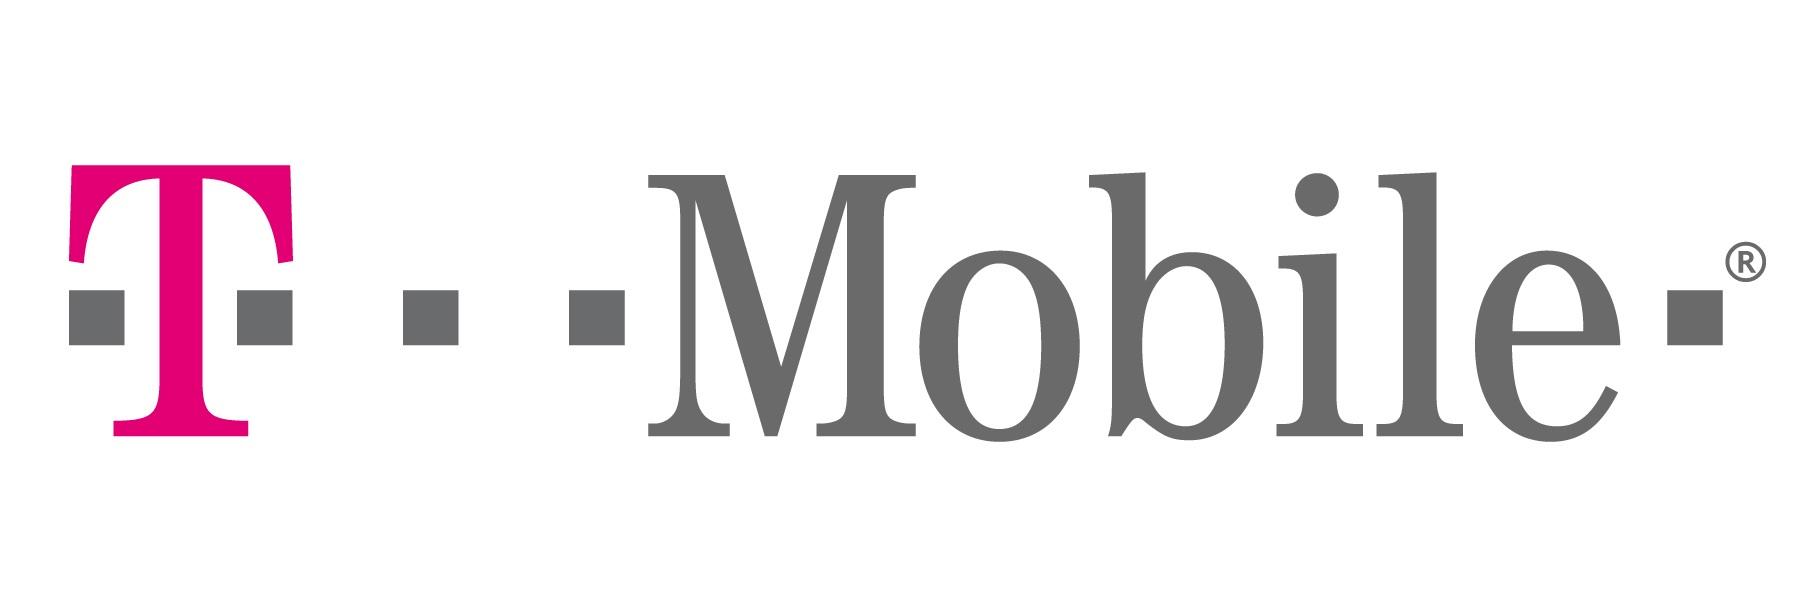 Costco S9 T-Mobile BOGO $679. S9+ rebate limit: $679. *Requires New Line*